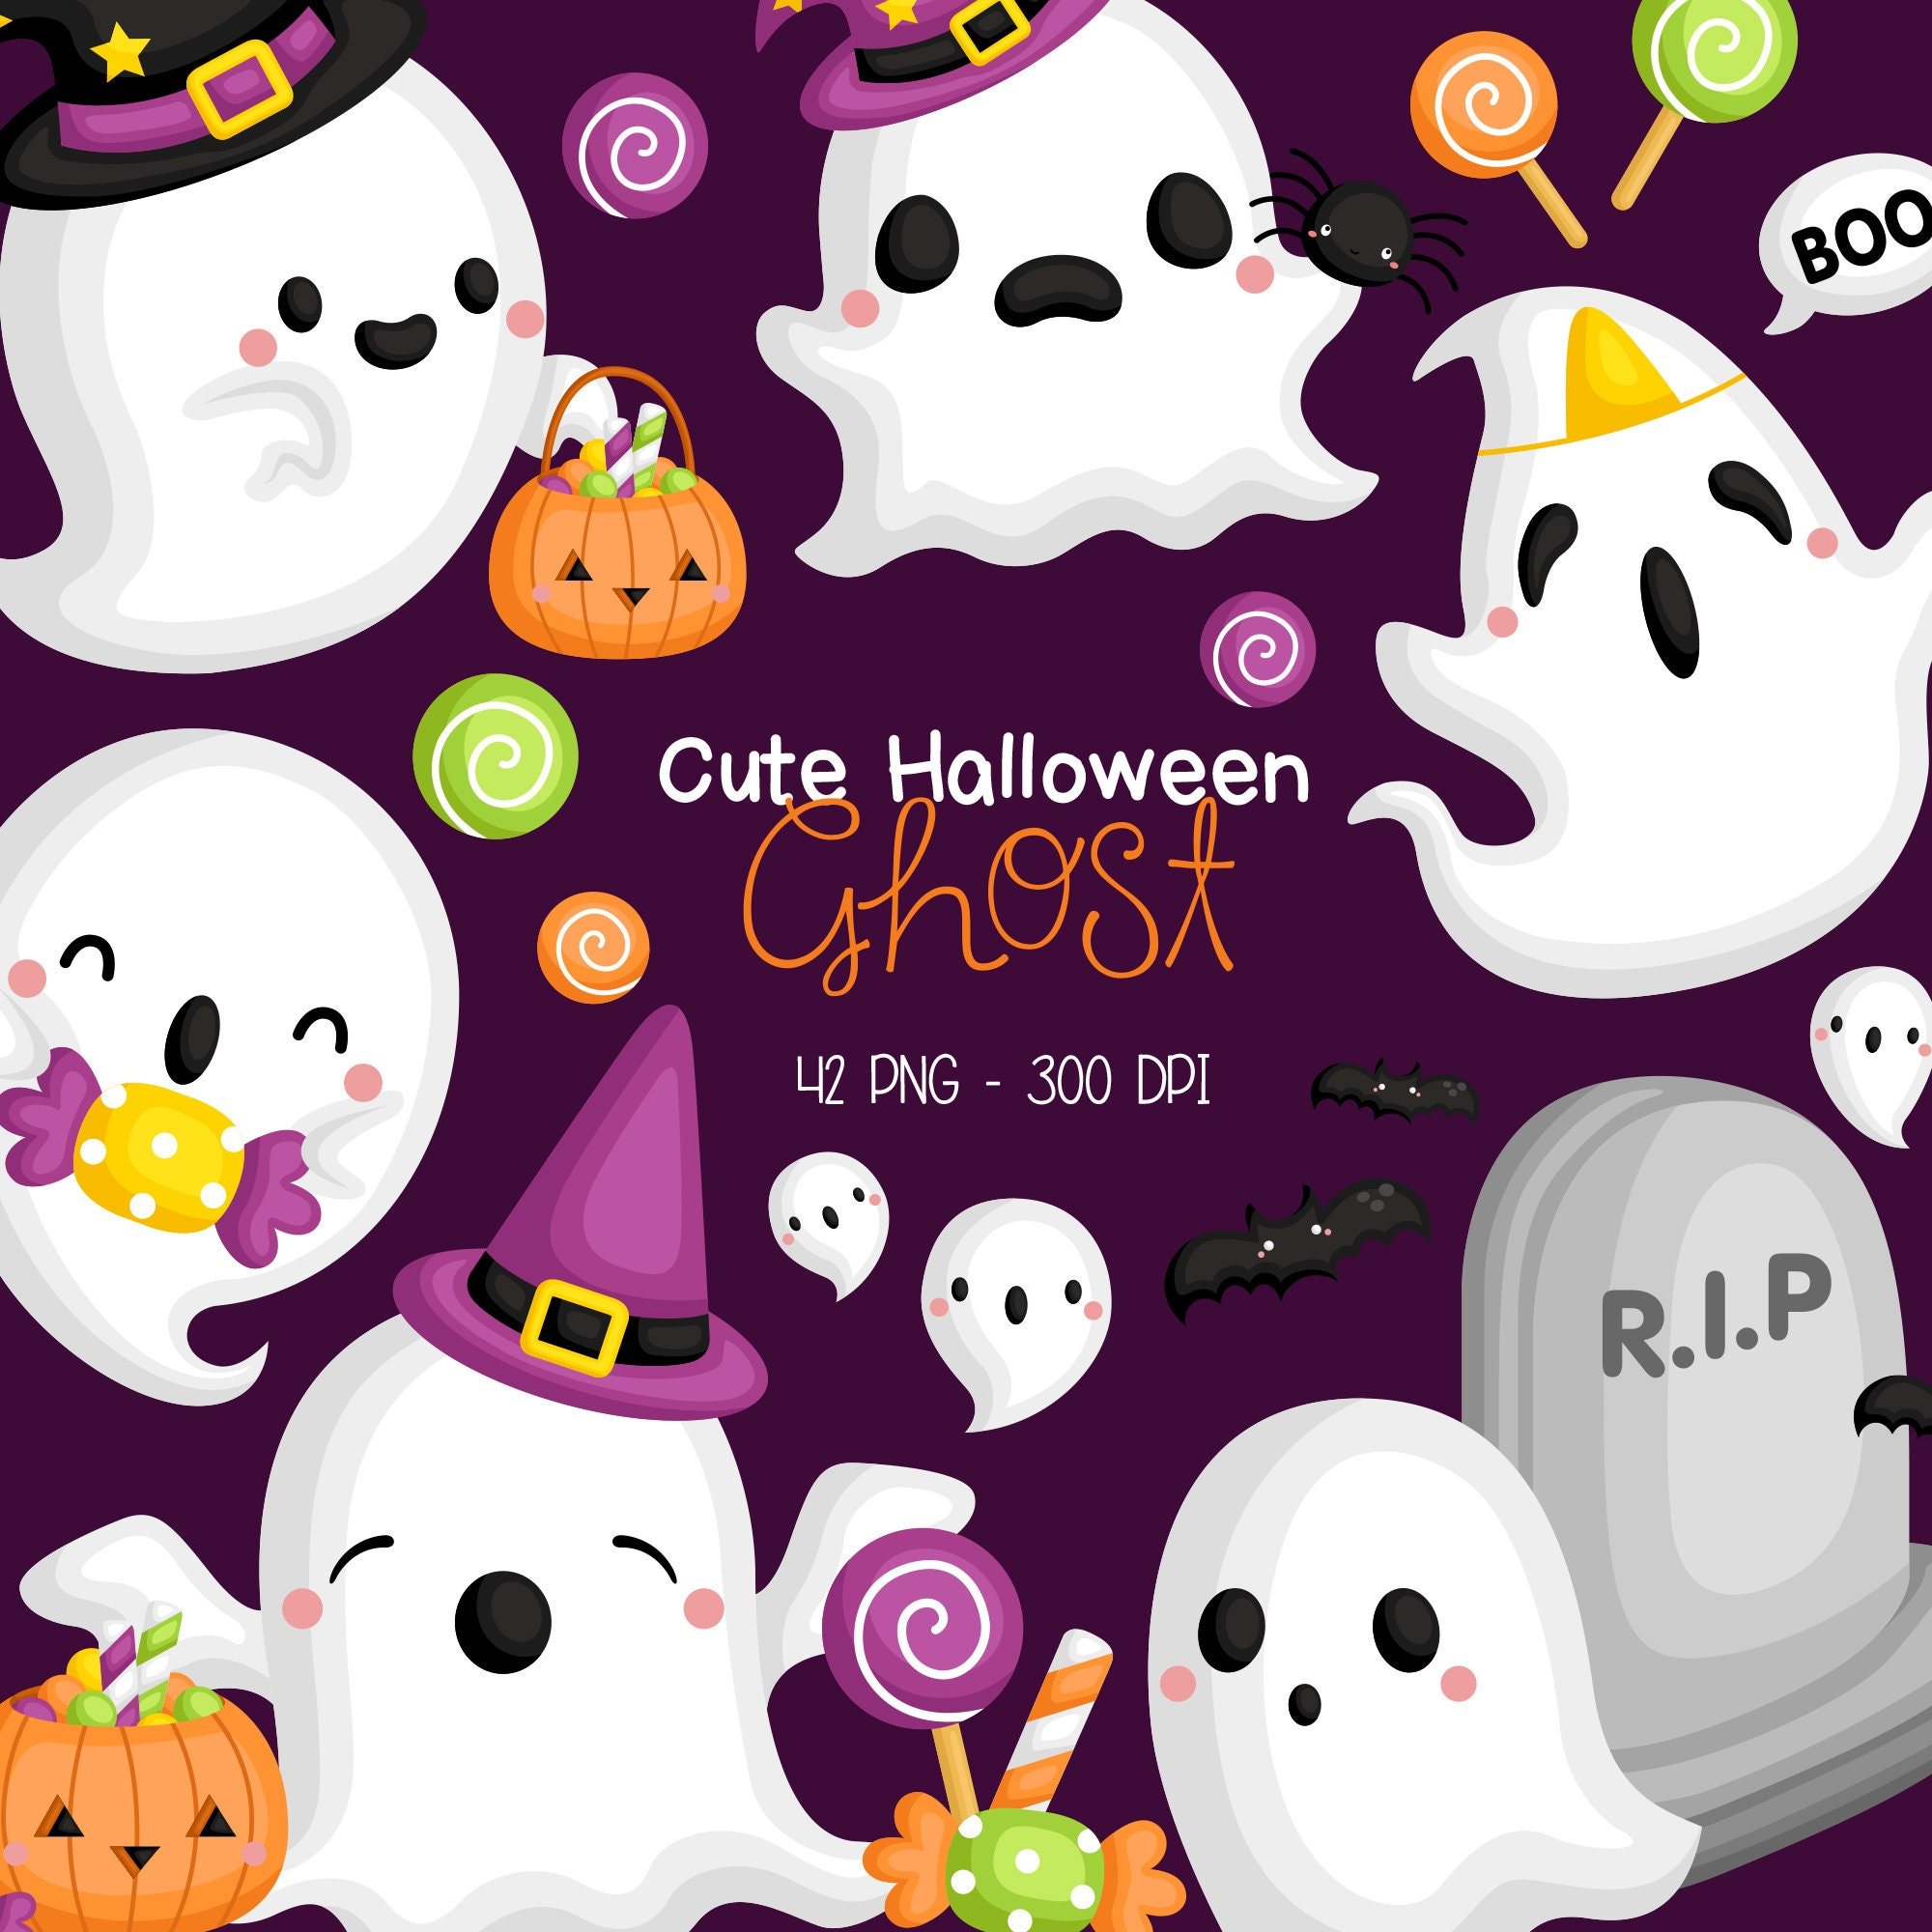 Spooky Ghosts SVG Clip Art Halloween SVG clip art Halloween decor instant download. Ghosts SVG Clipart